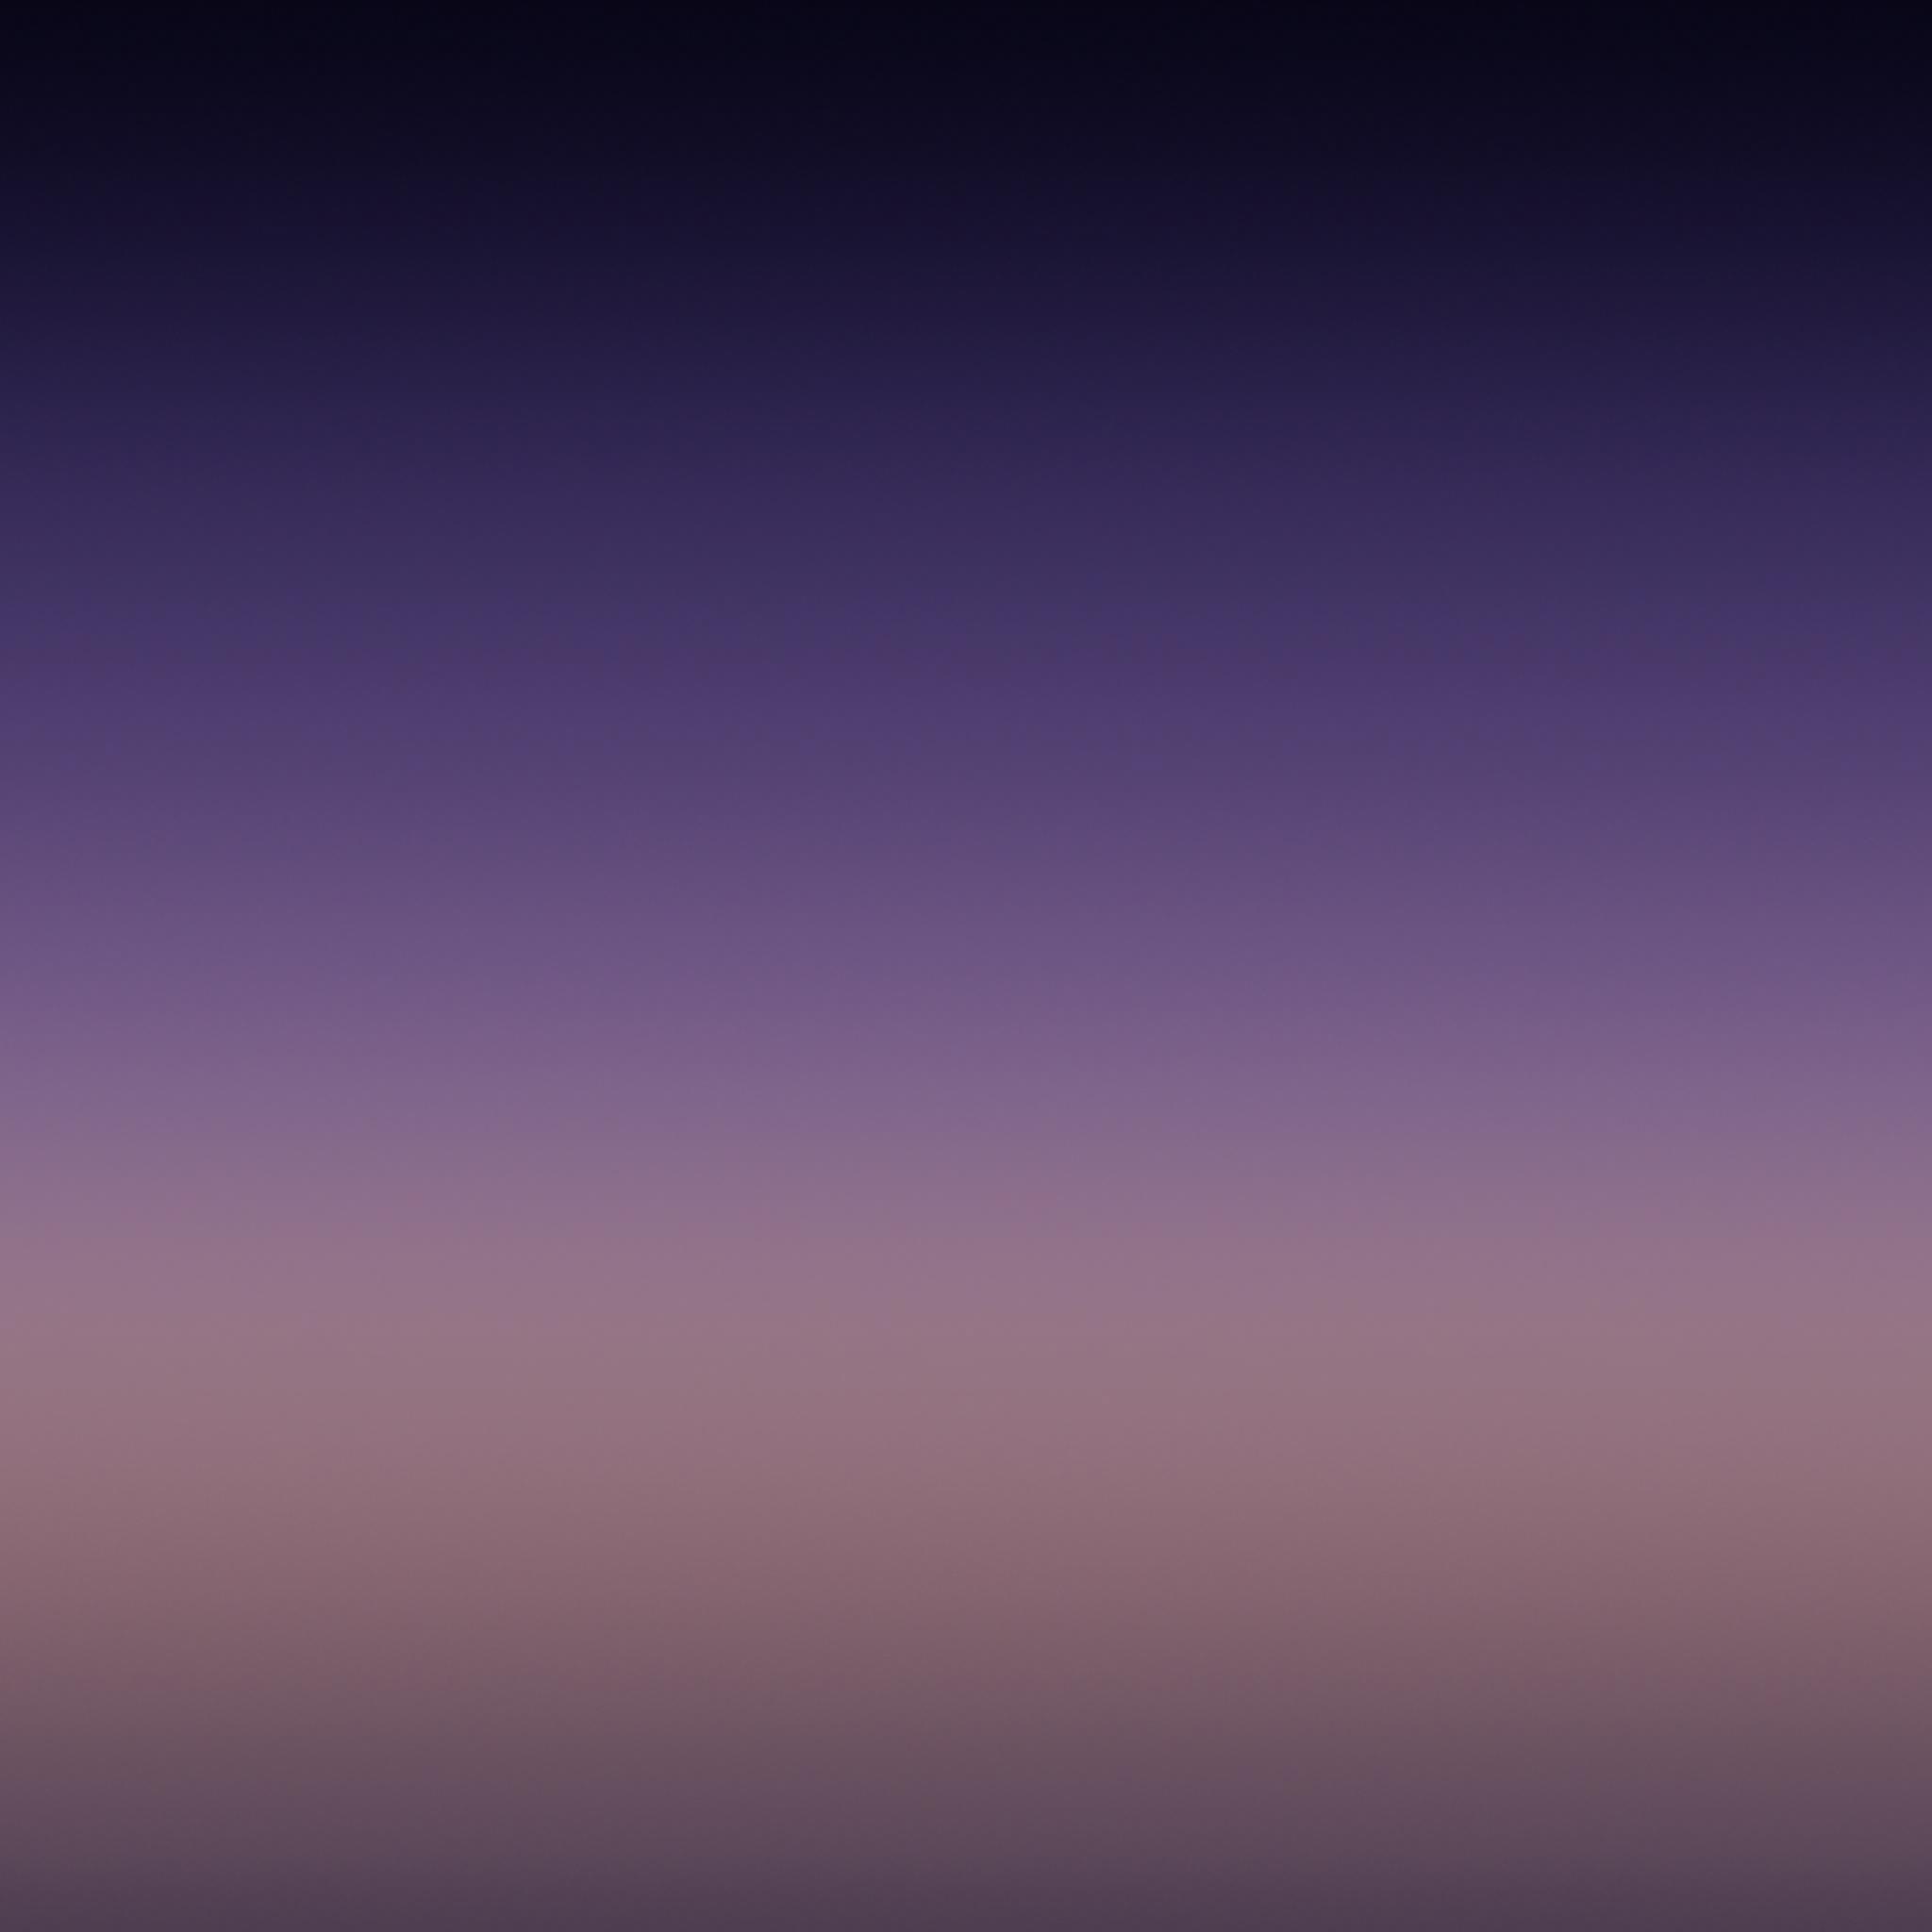 galaxy_note8-wallpapers_techfoogle.com_3